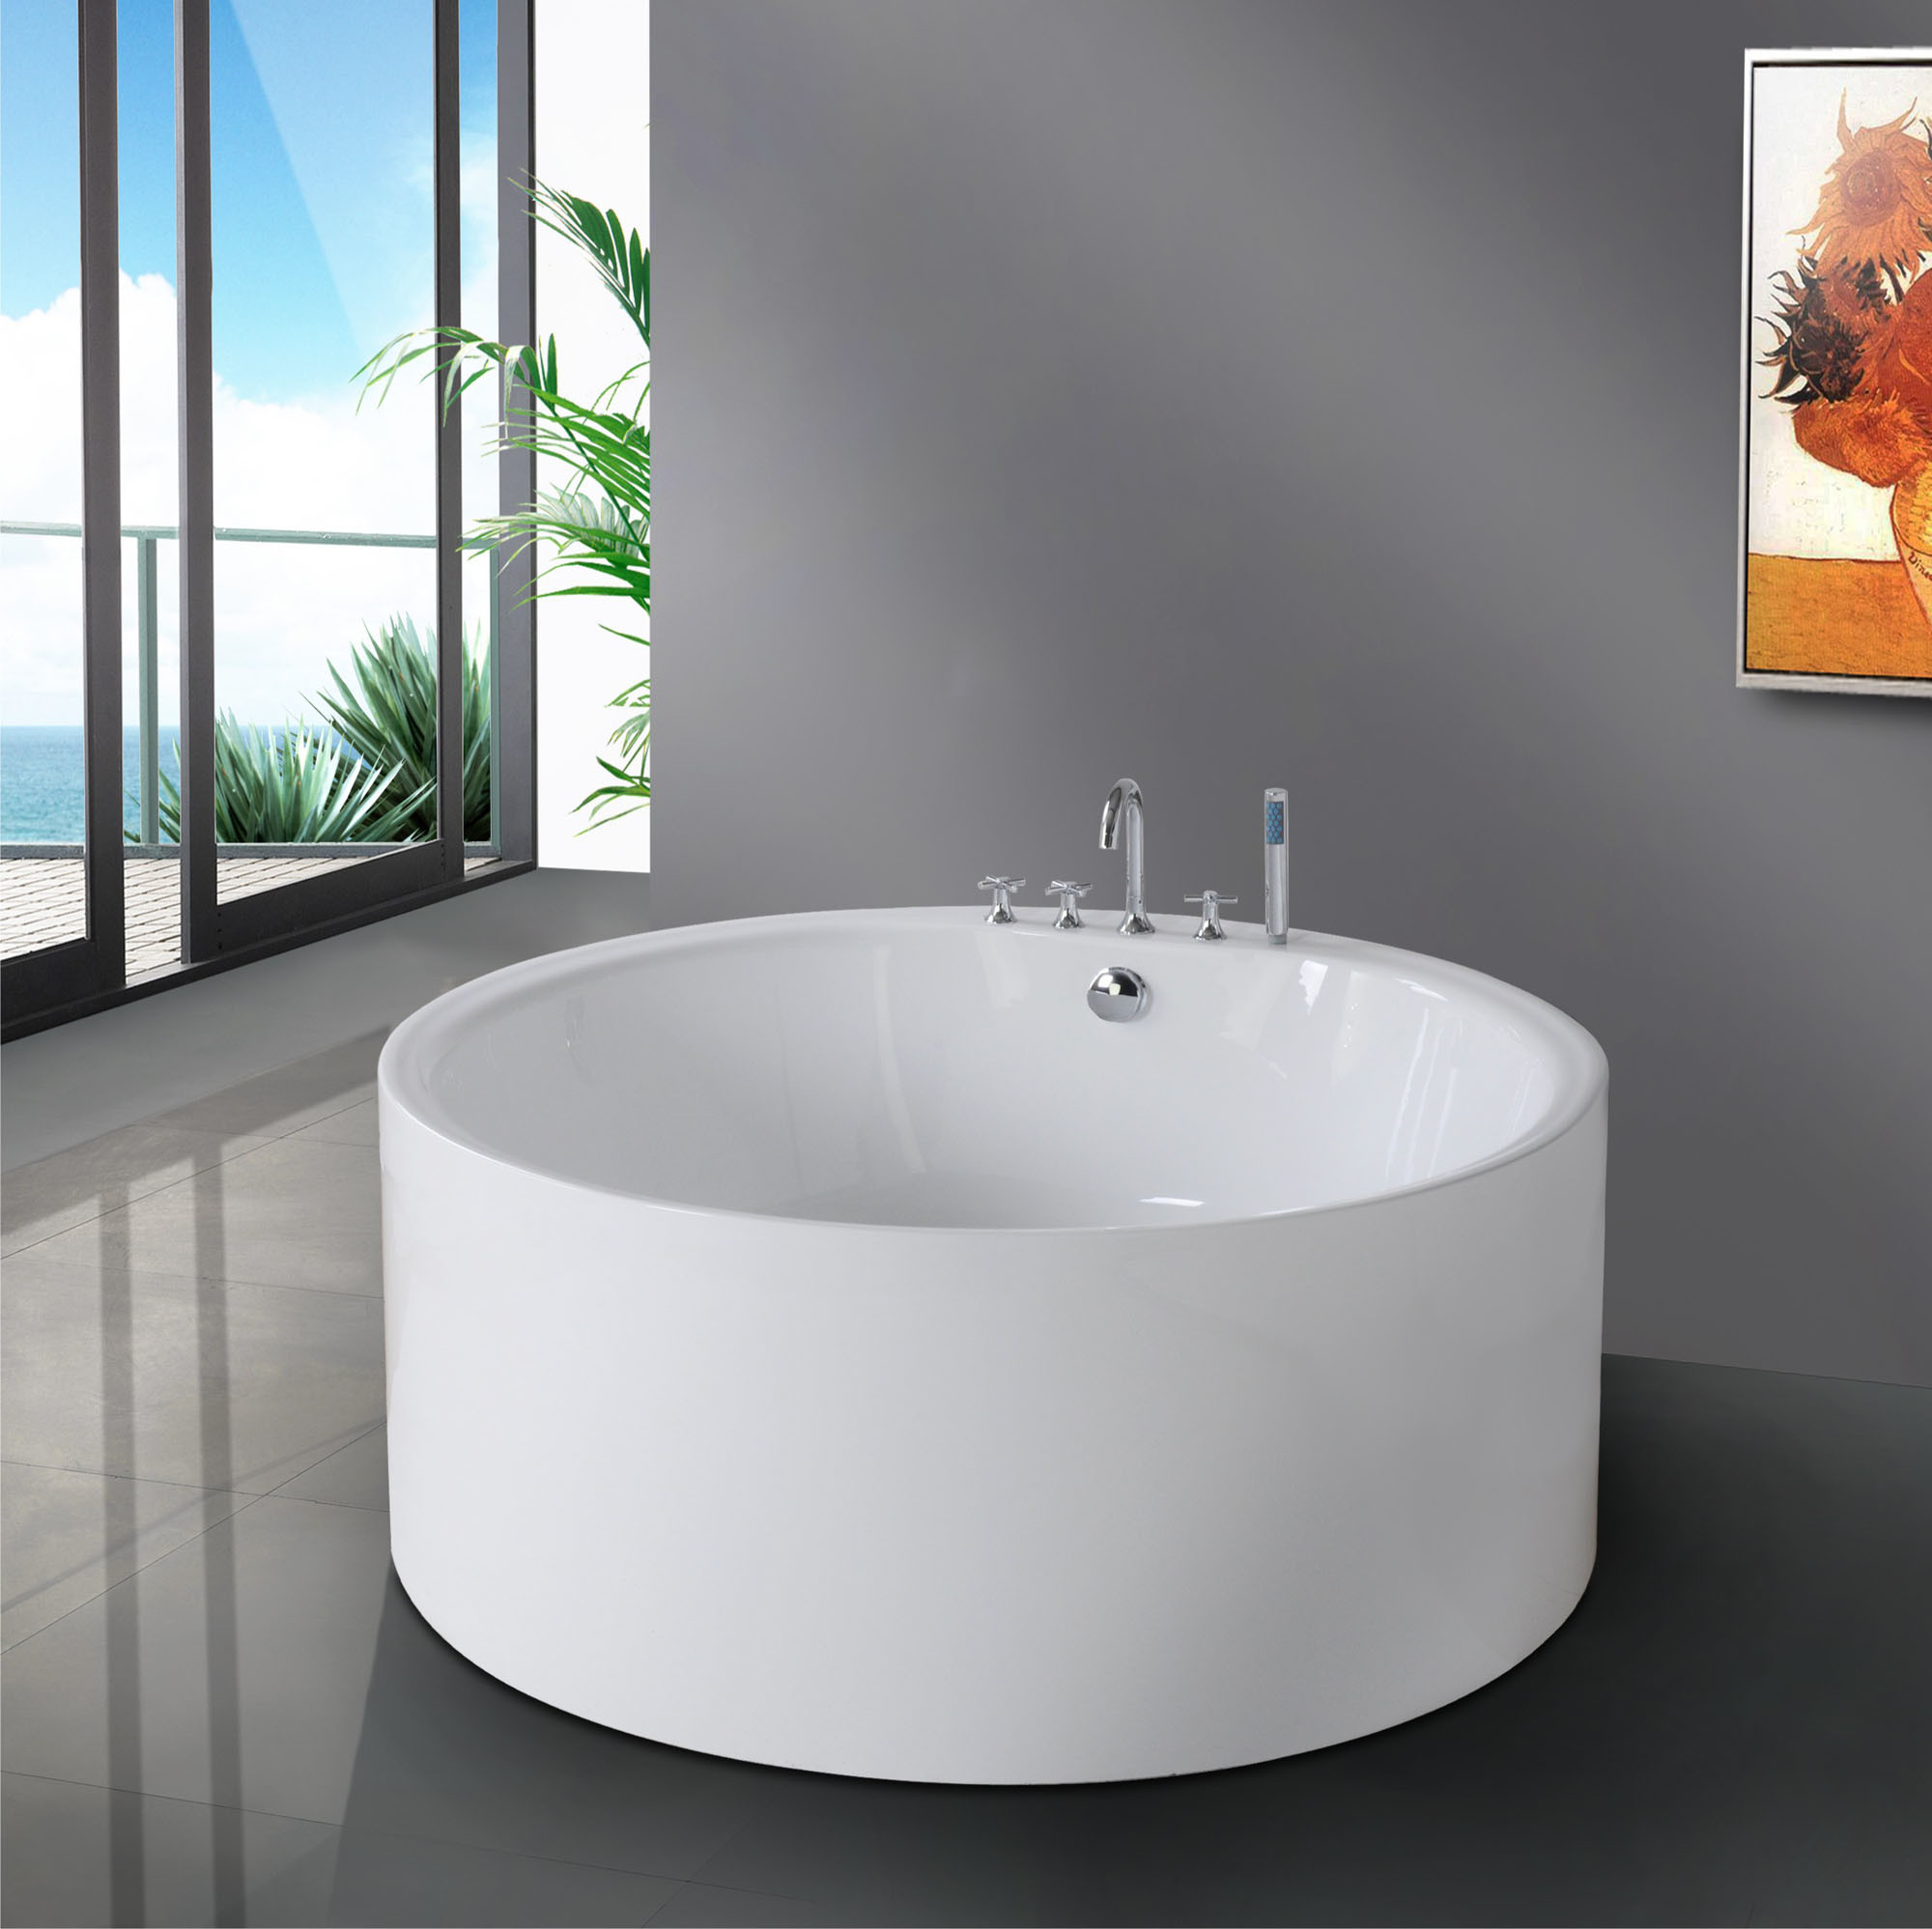 Vasca da bagno rotonda BF-6637 – Vasca da bagno rotonda BF ...